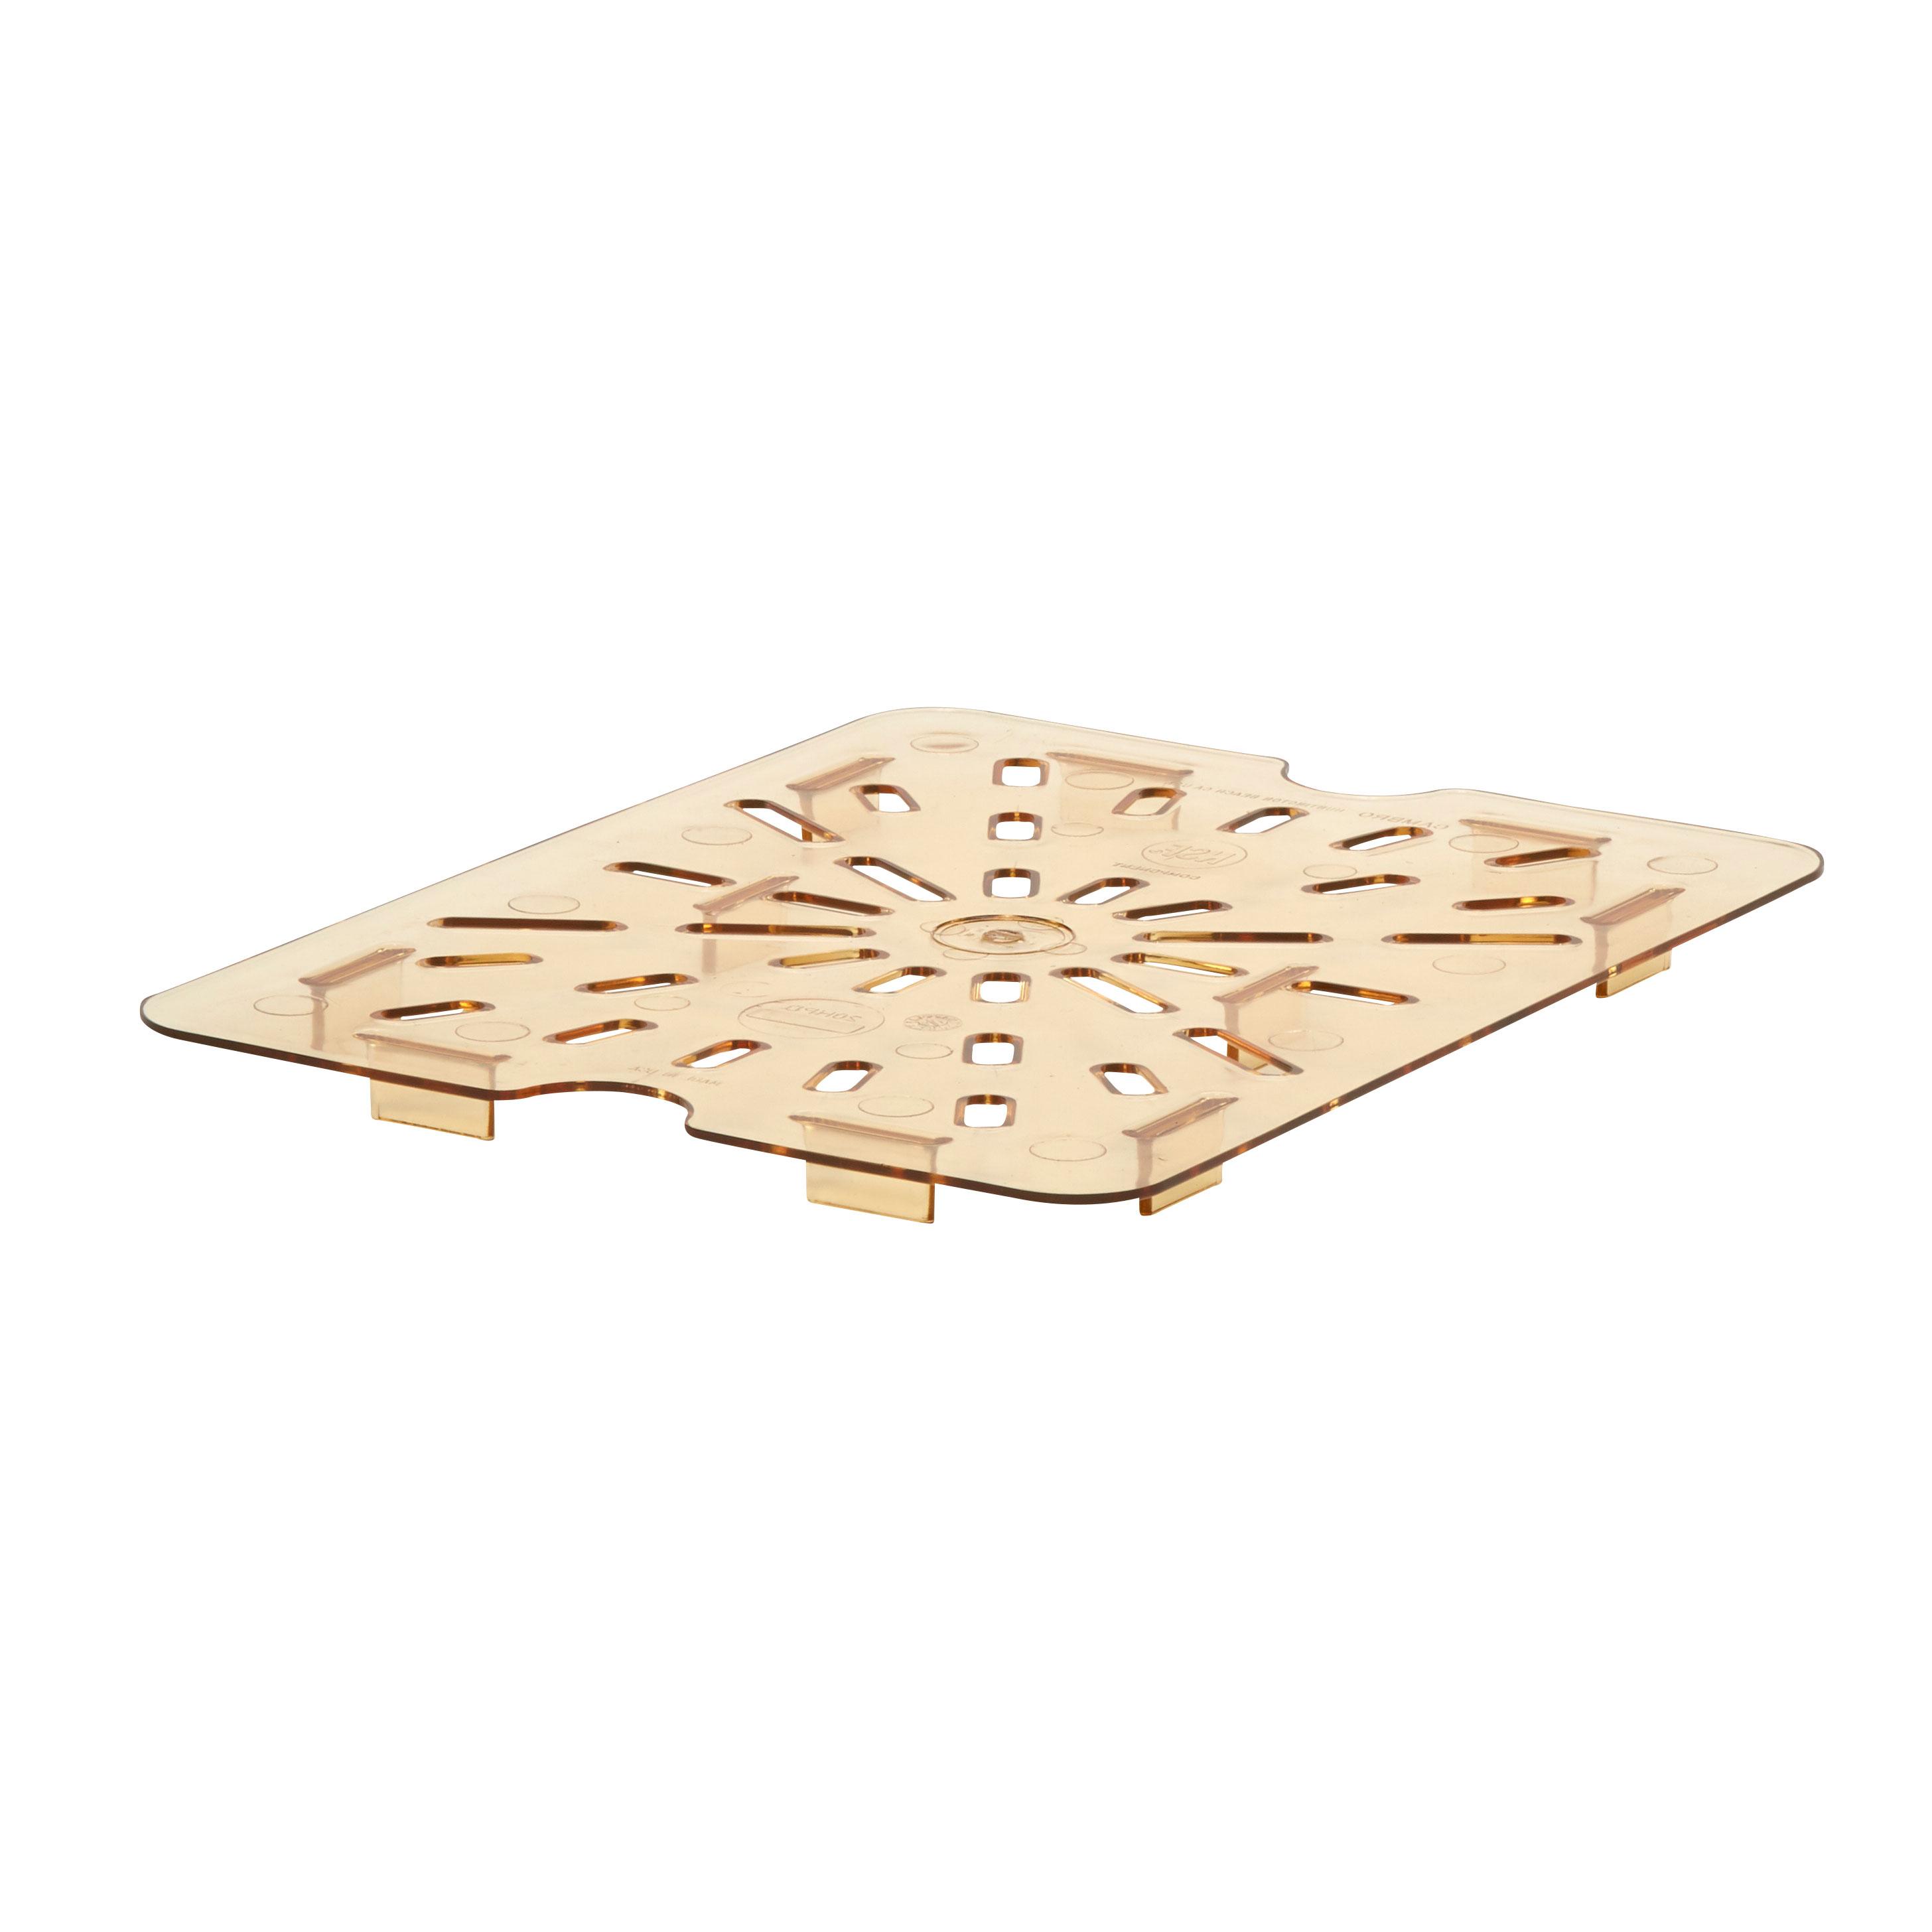 2410-121 Cambro 20HPD150 food pan drain tray